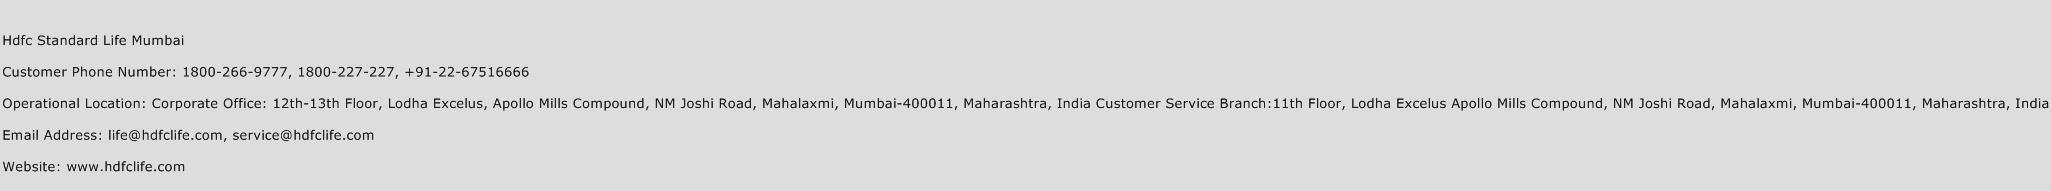 Hdfc Standard Life Mumbai Phone Number Customer Service